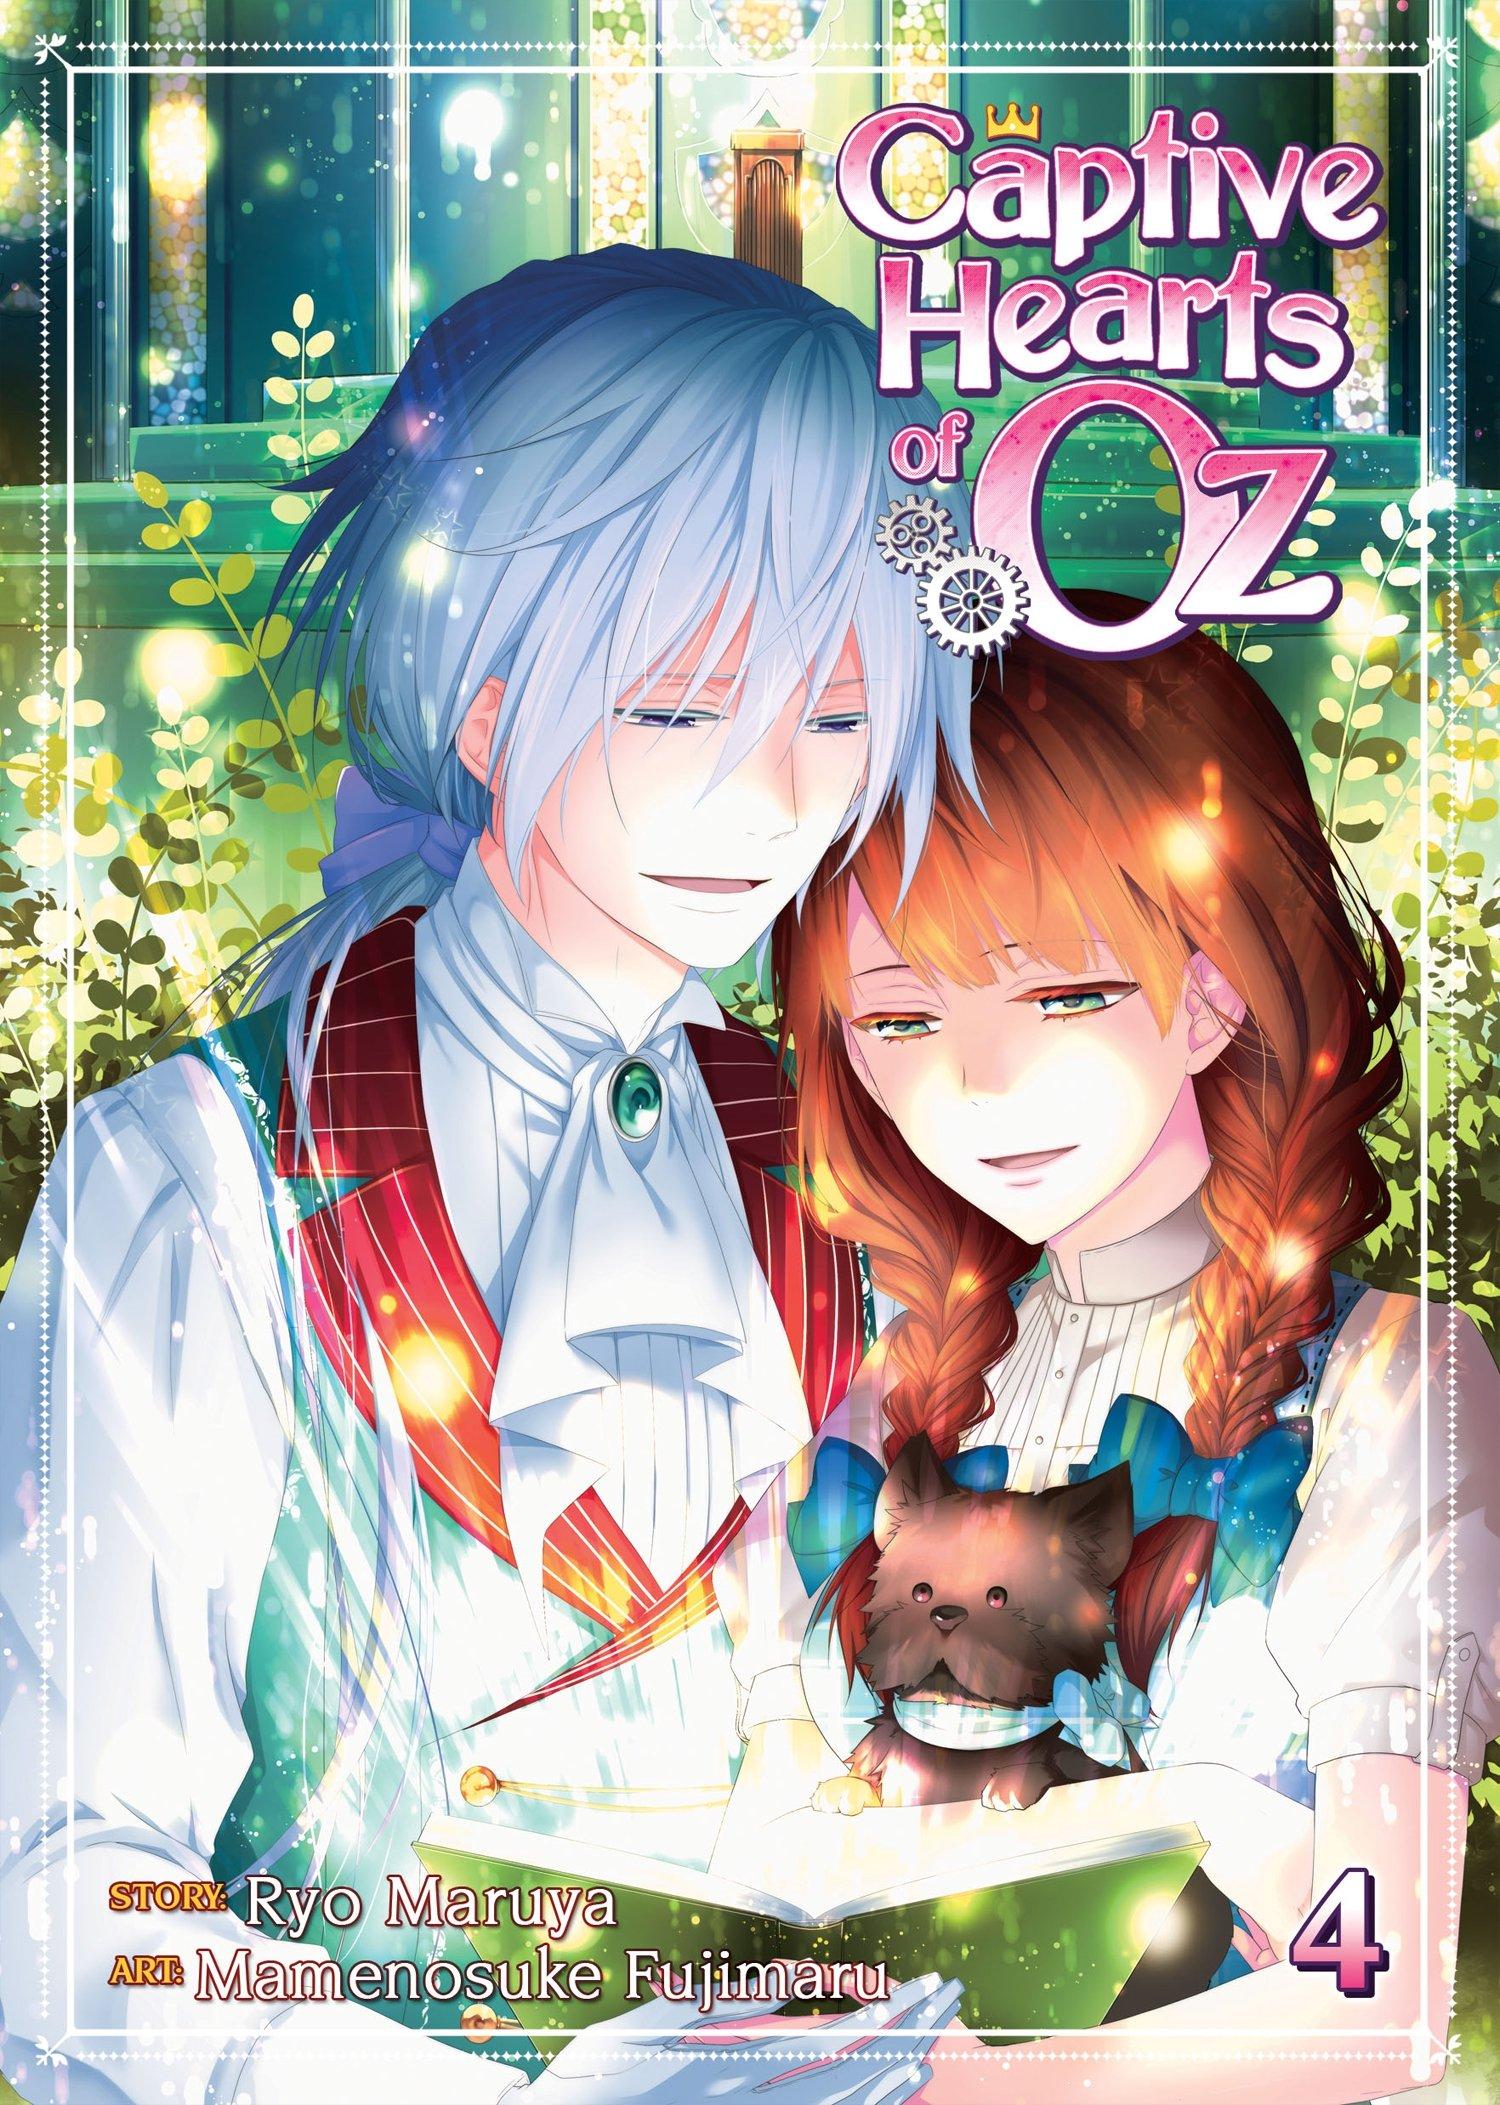 Amazon.com: Captive Hearts of Oz Vol. 4 (9781626926677): Ryo Maruya,  Mamenosuke Fujimaru: Books